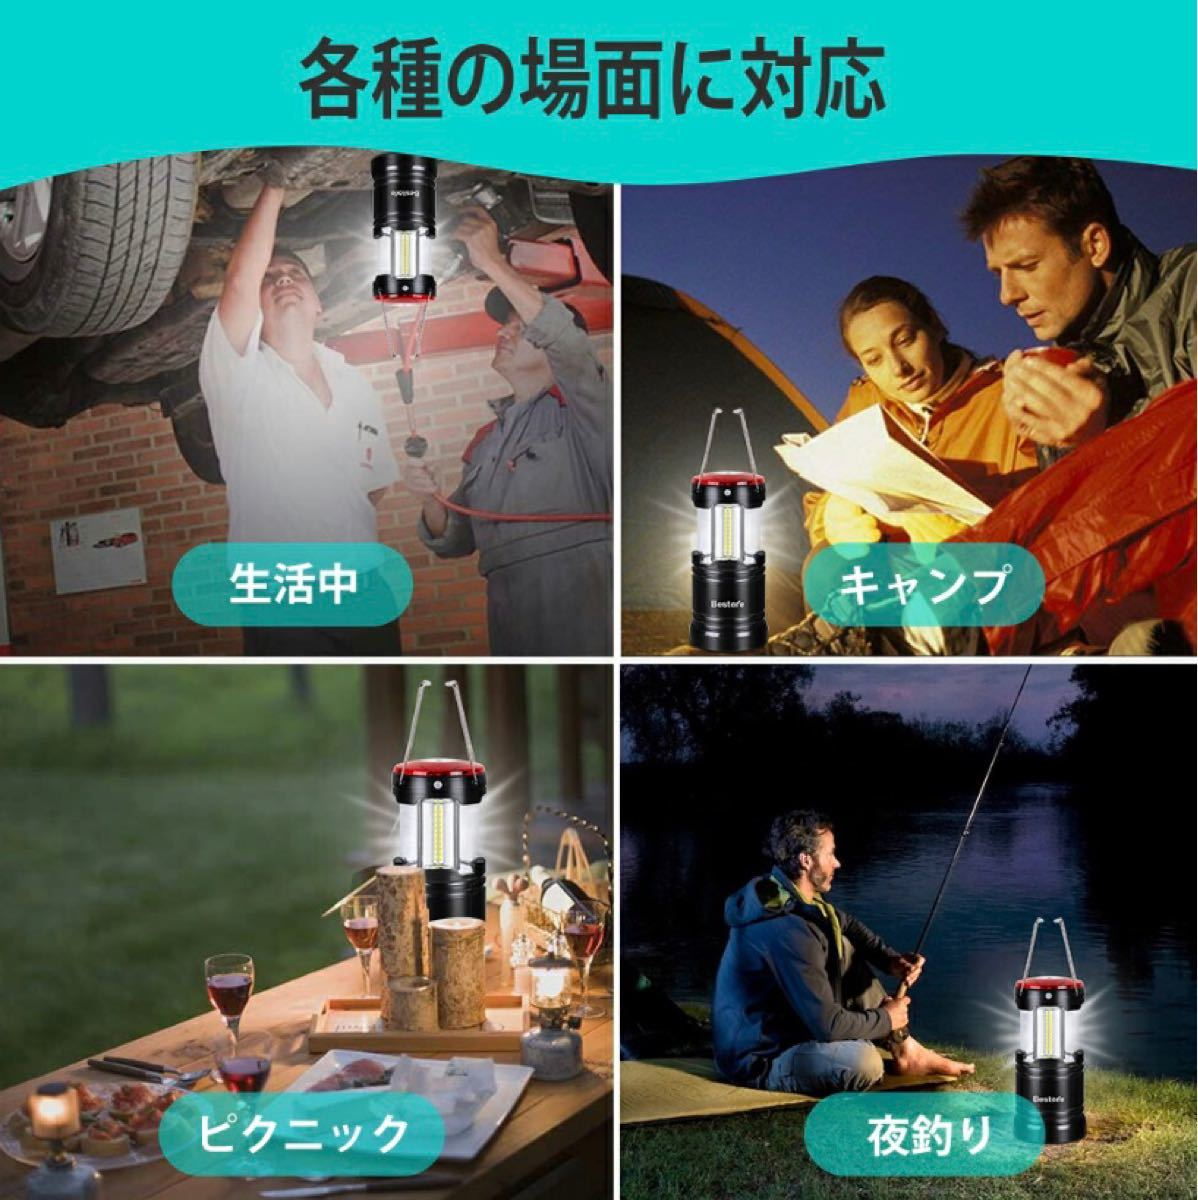 led ランタン 充電式 usb ledライト 小型 防水 防塵 電池式 防災